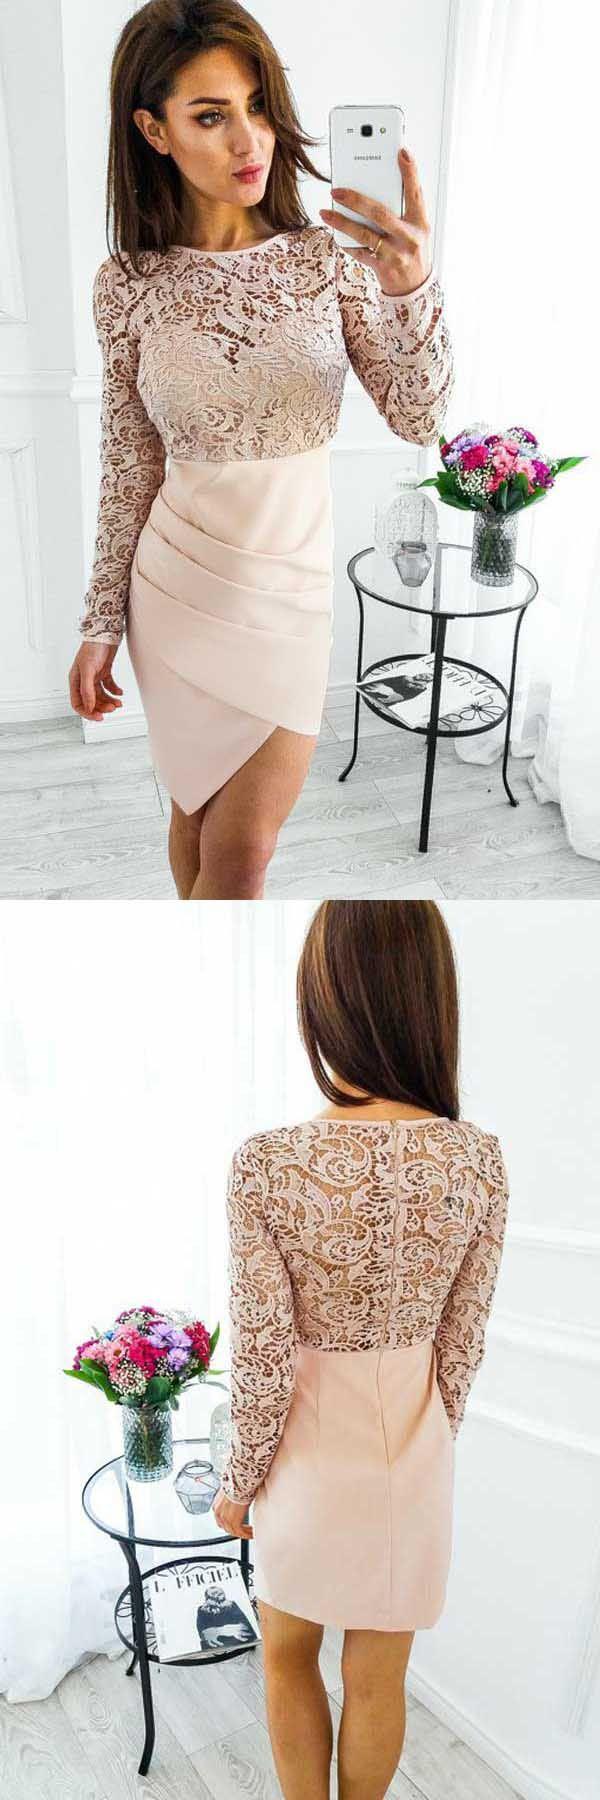 best short prom dresses images on pinterest backless summer